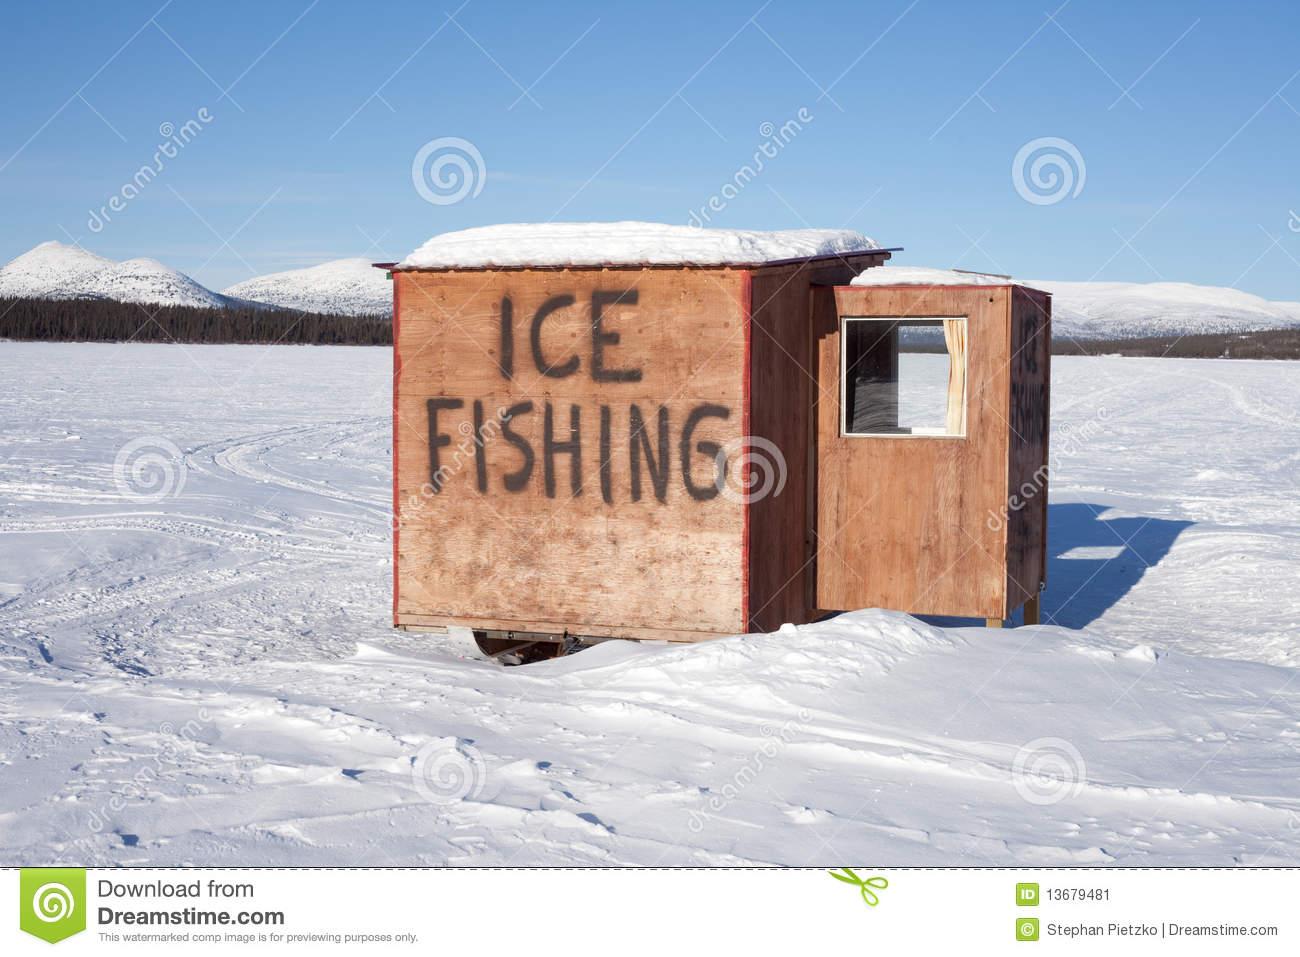 Ice Fishing Hut Stock Image.